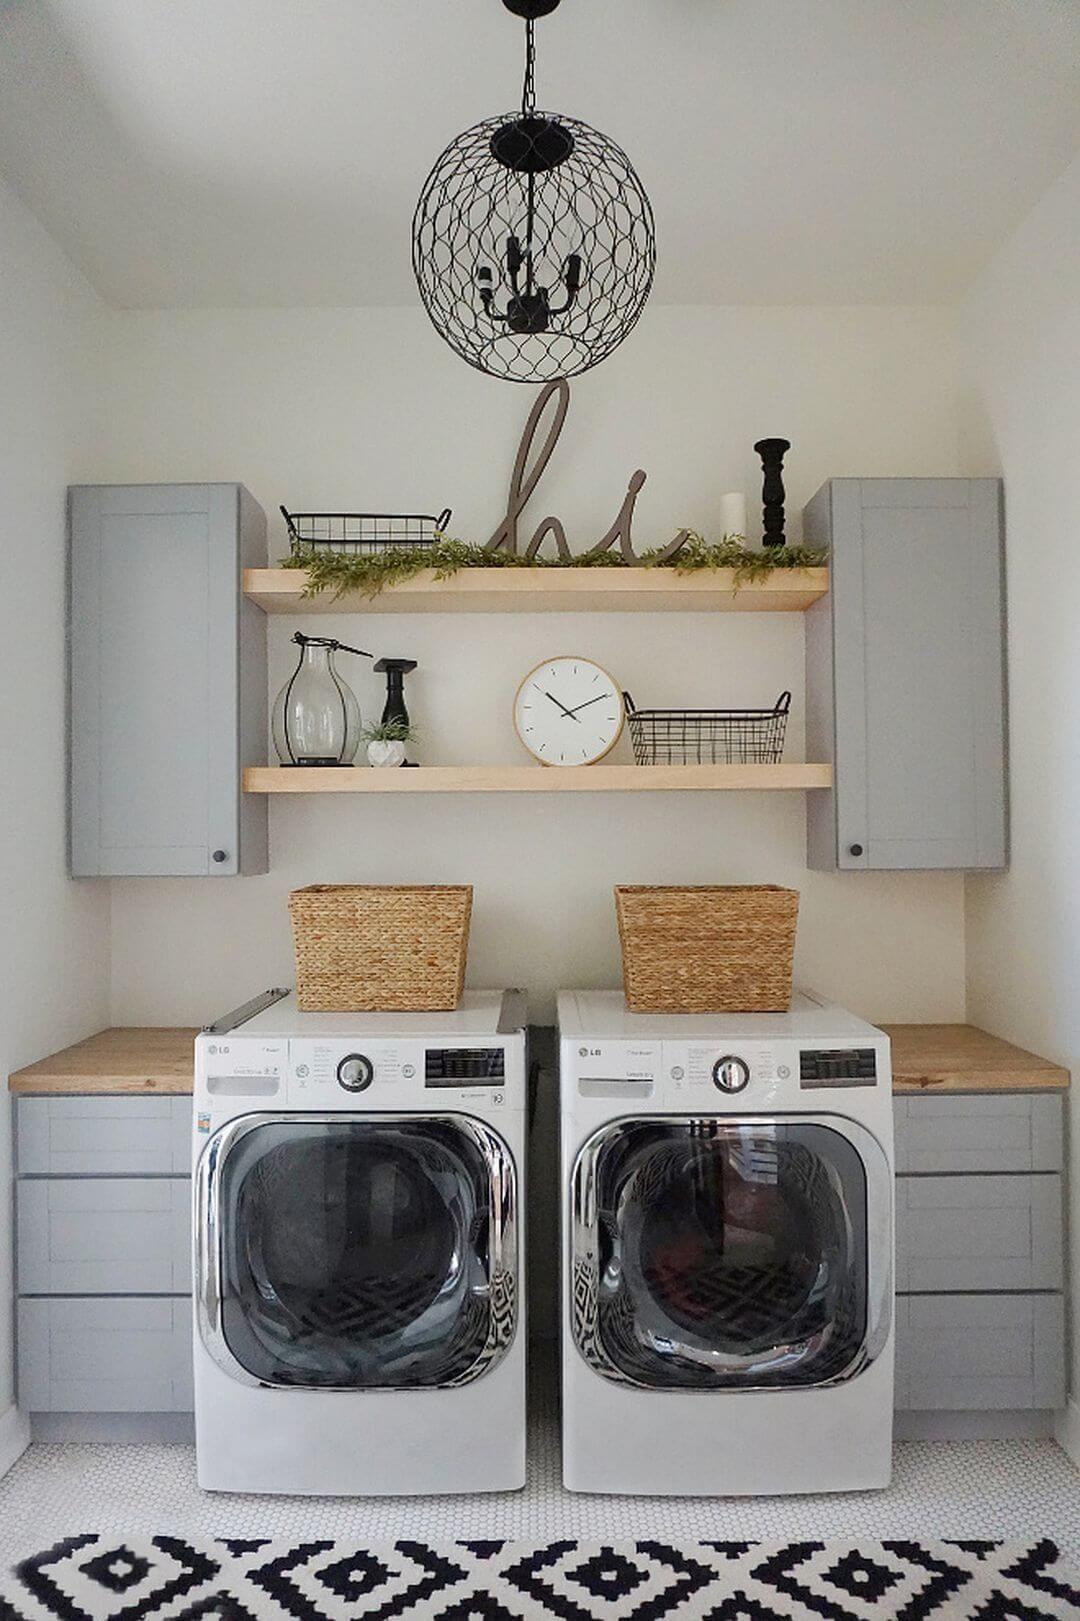 60 Farmhouse Laundry Room Ideas To Organize Your Laundry With Charm Laundry Room Organization Storage Laundry Room Tile Farmhouse Laundry Room